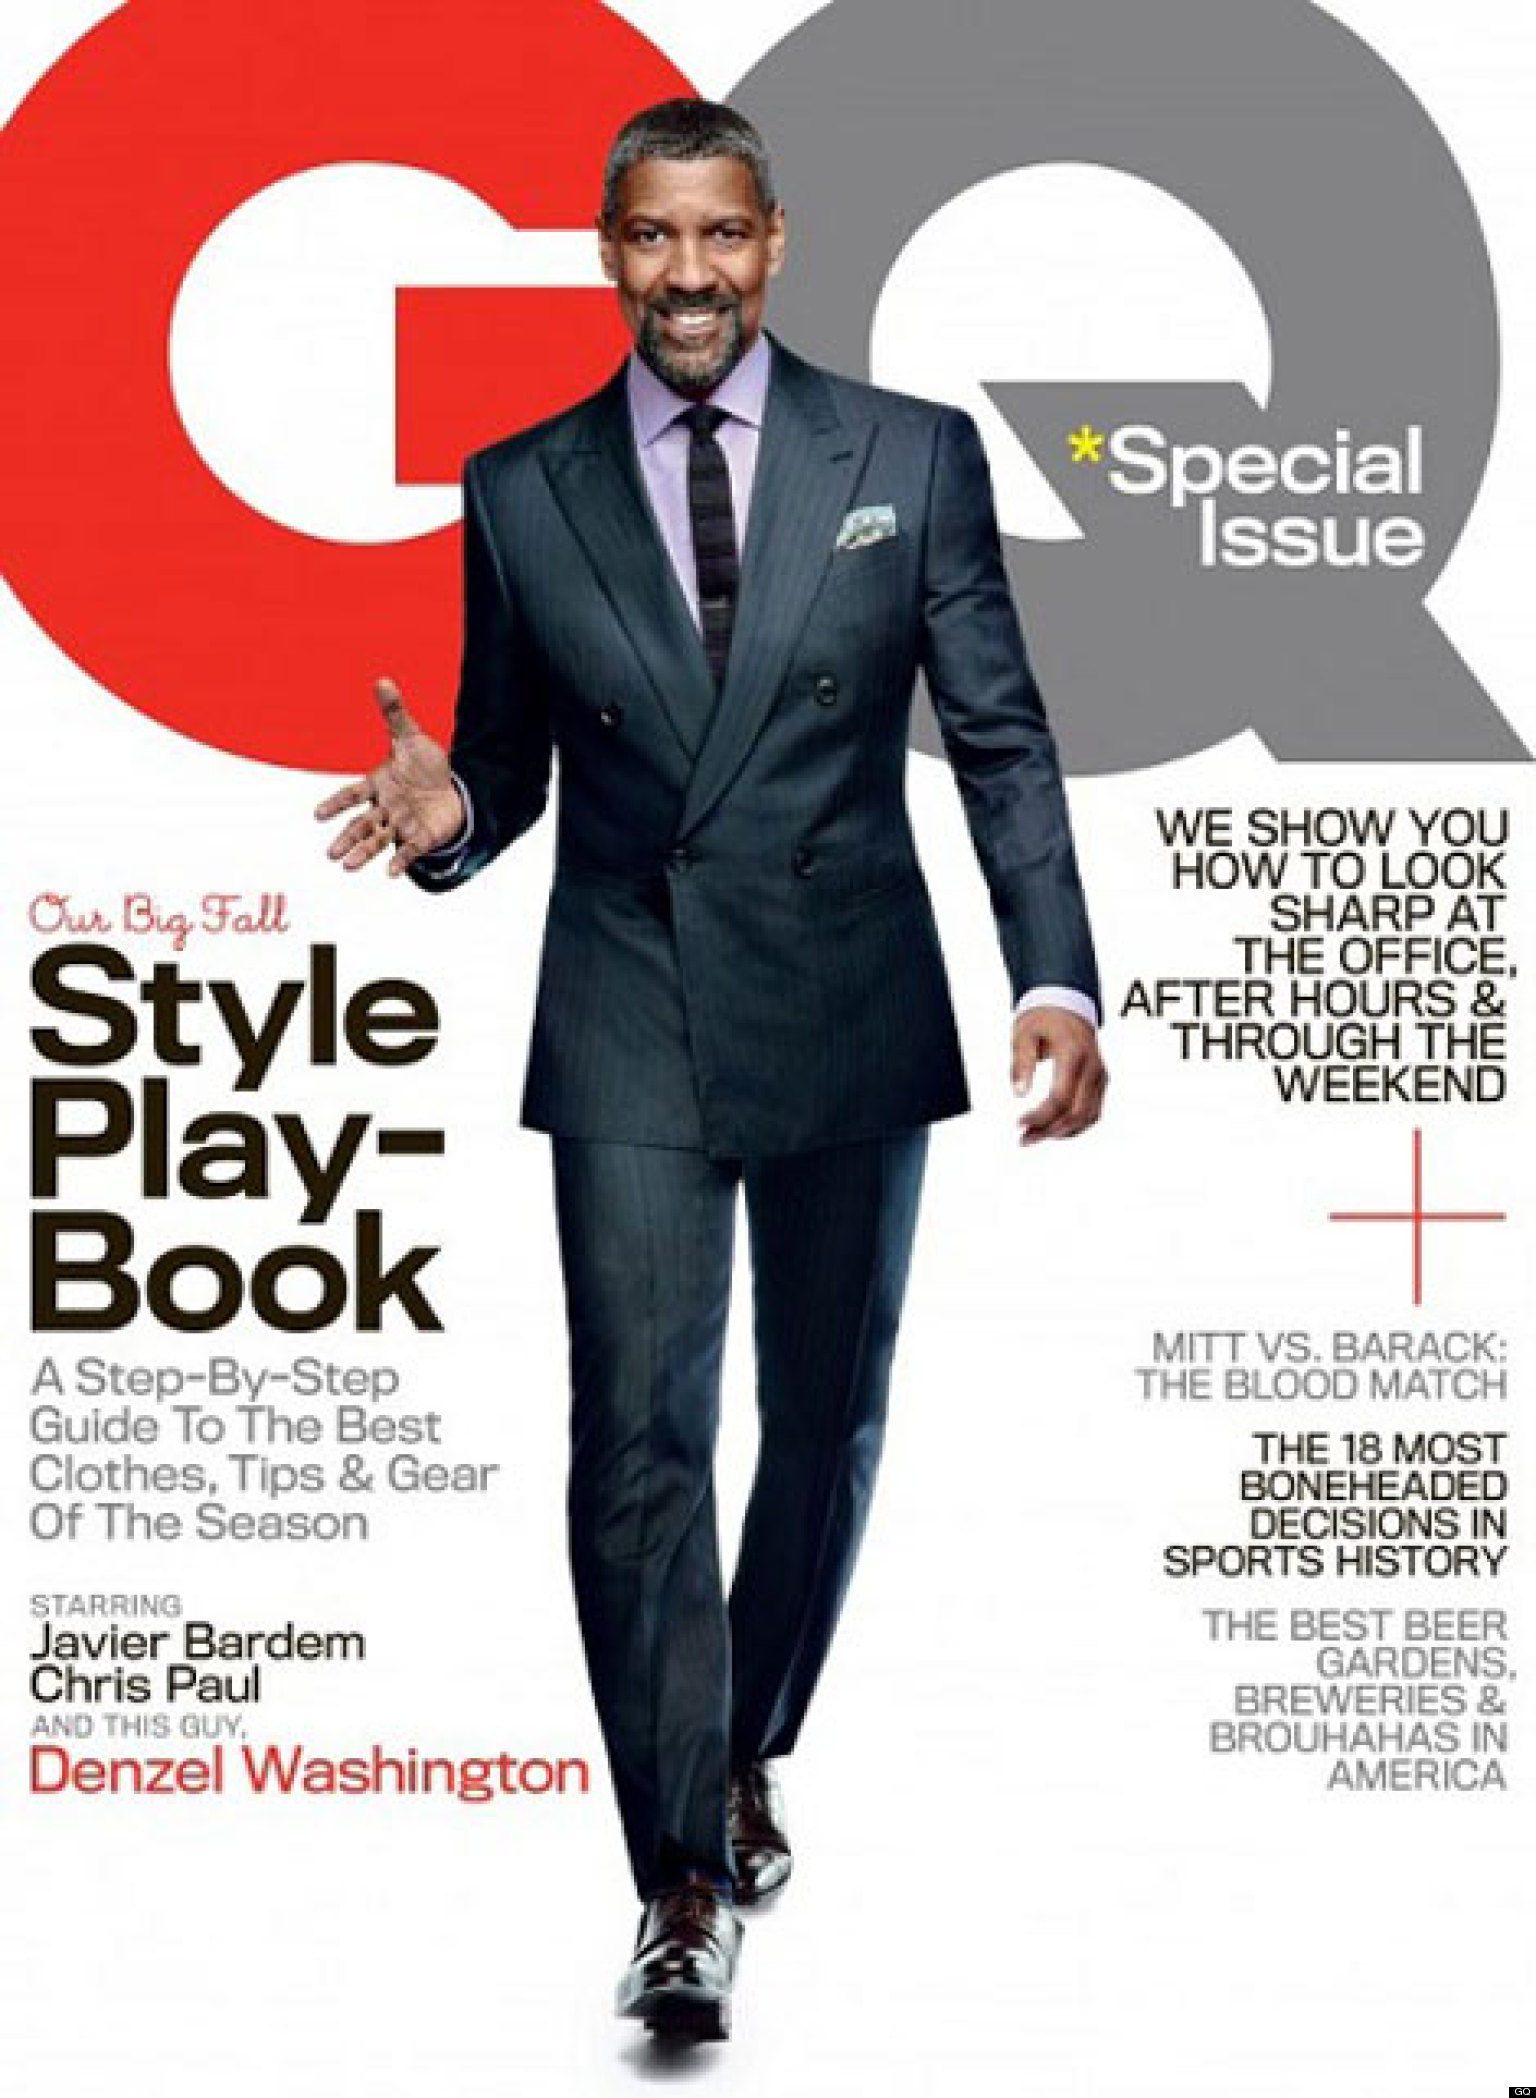 Denzel Washington Body